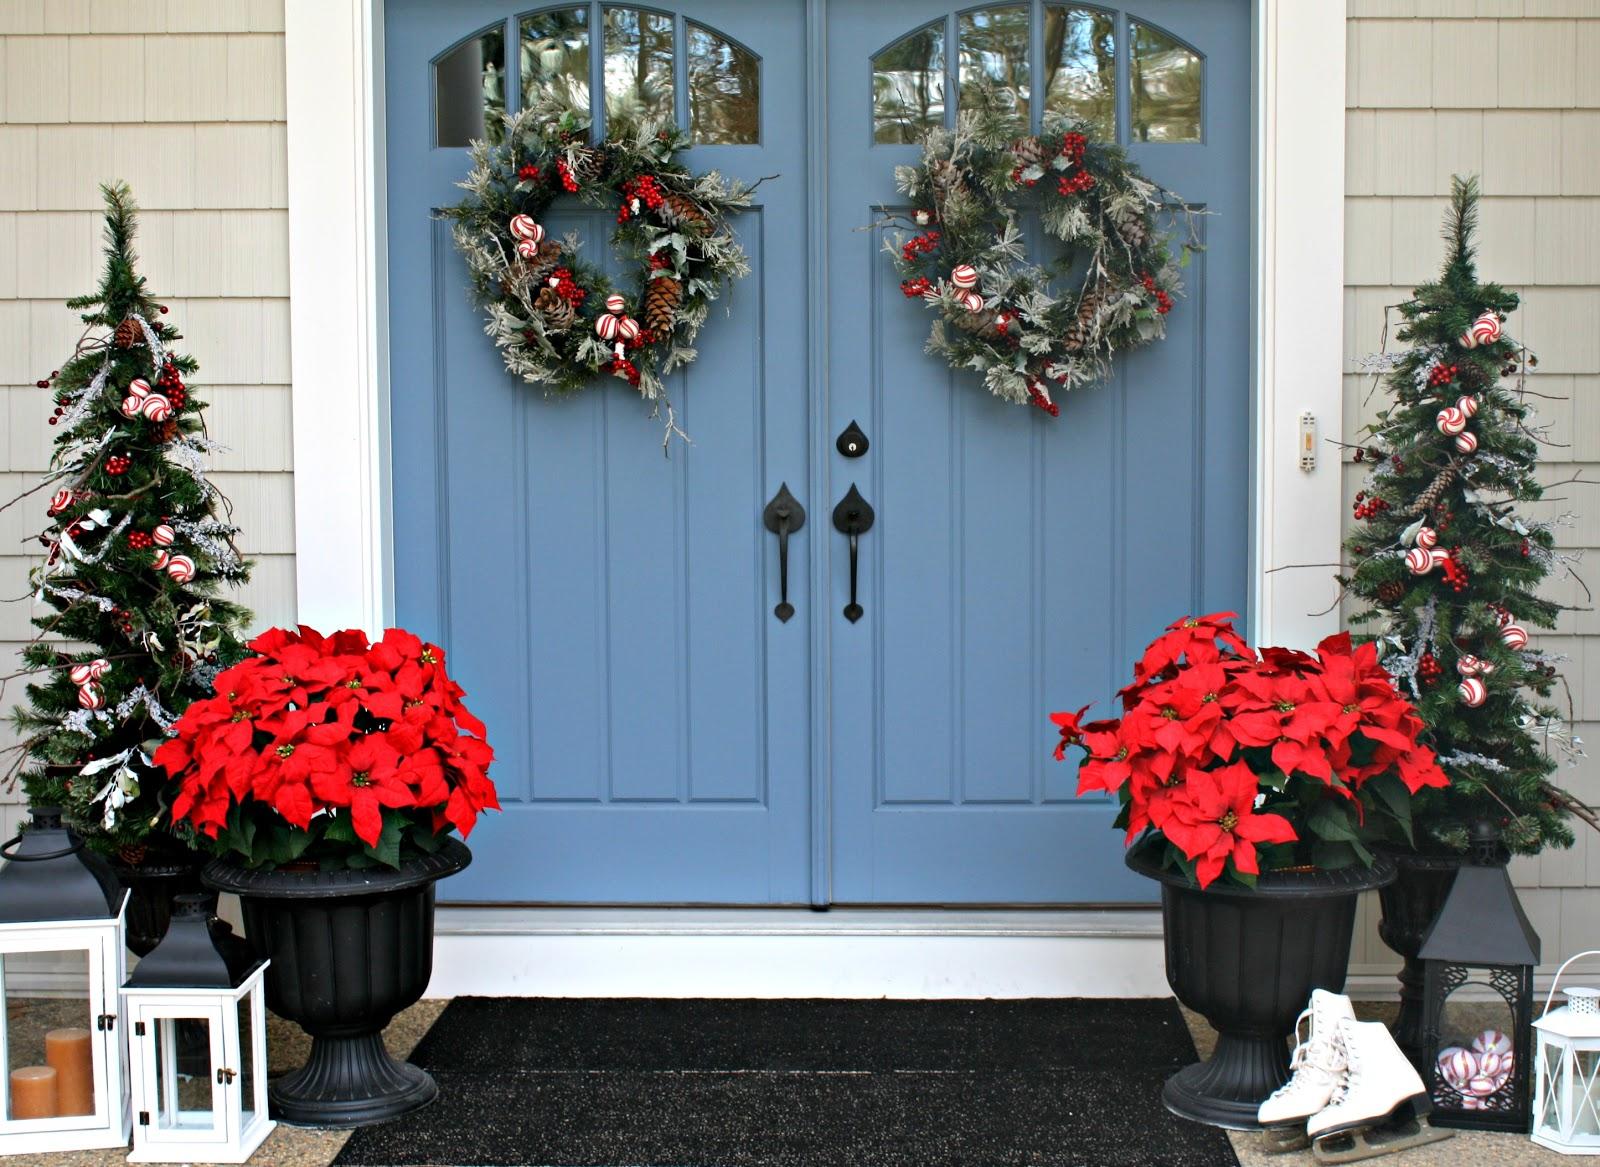 Bonus Christmas Porch The Lilypad Cottage